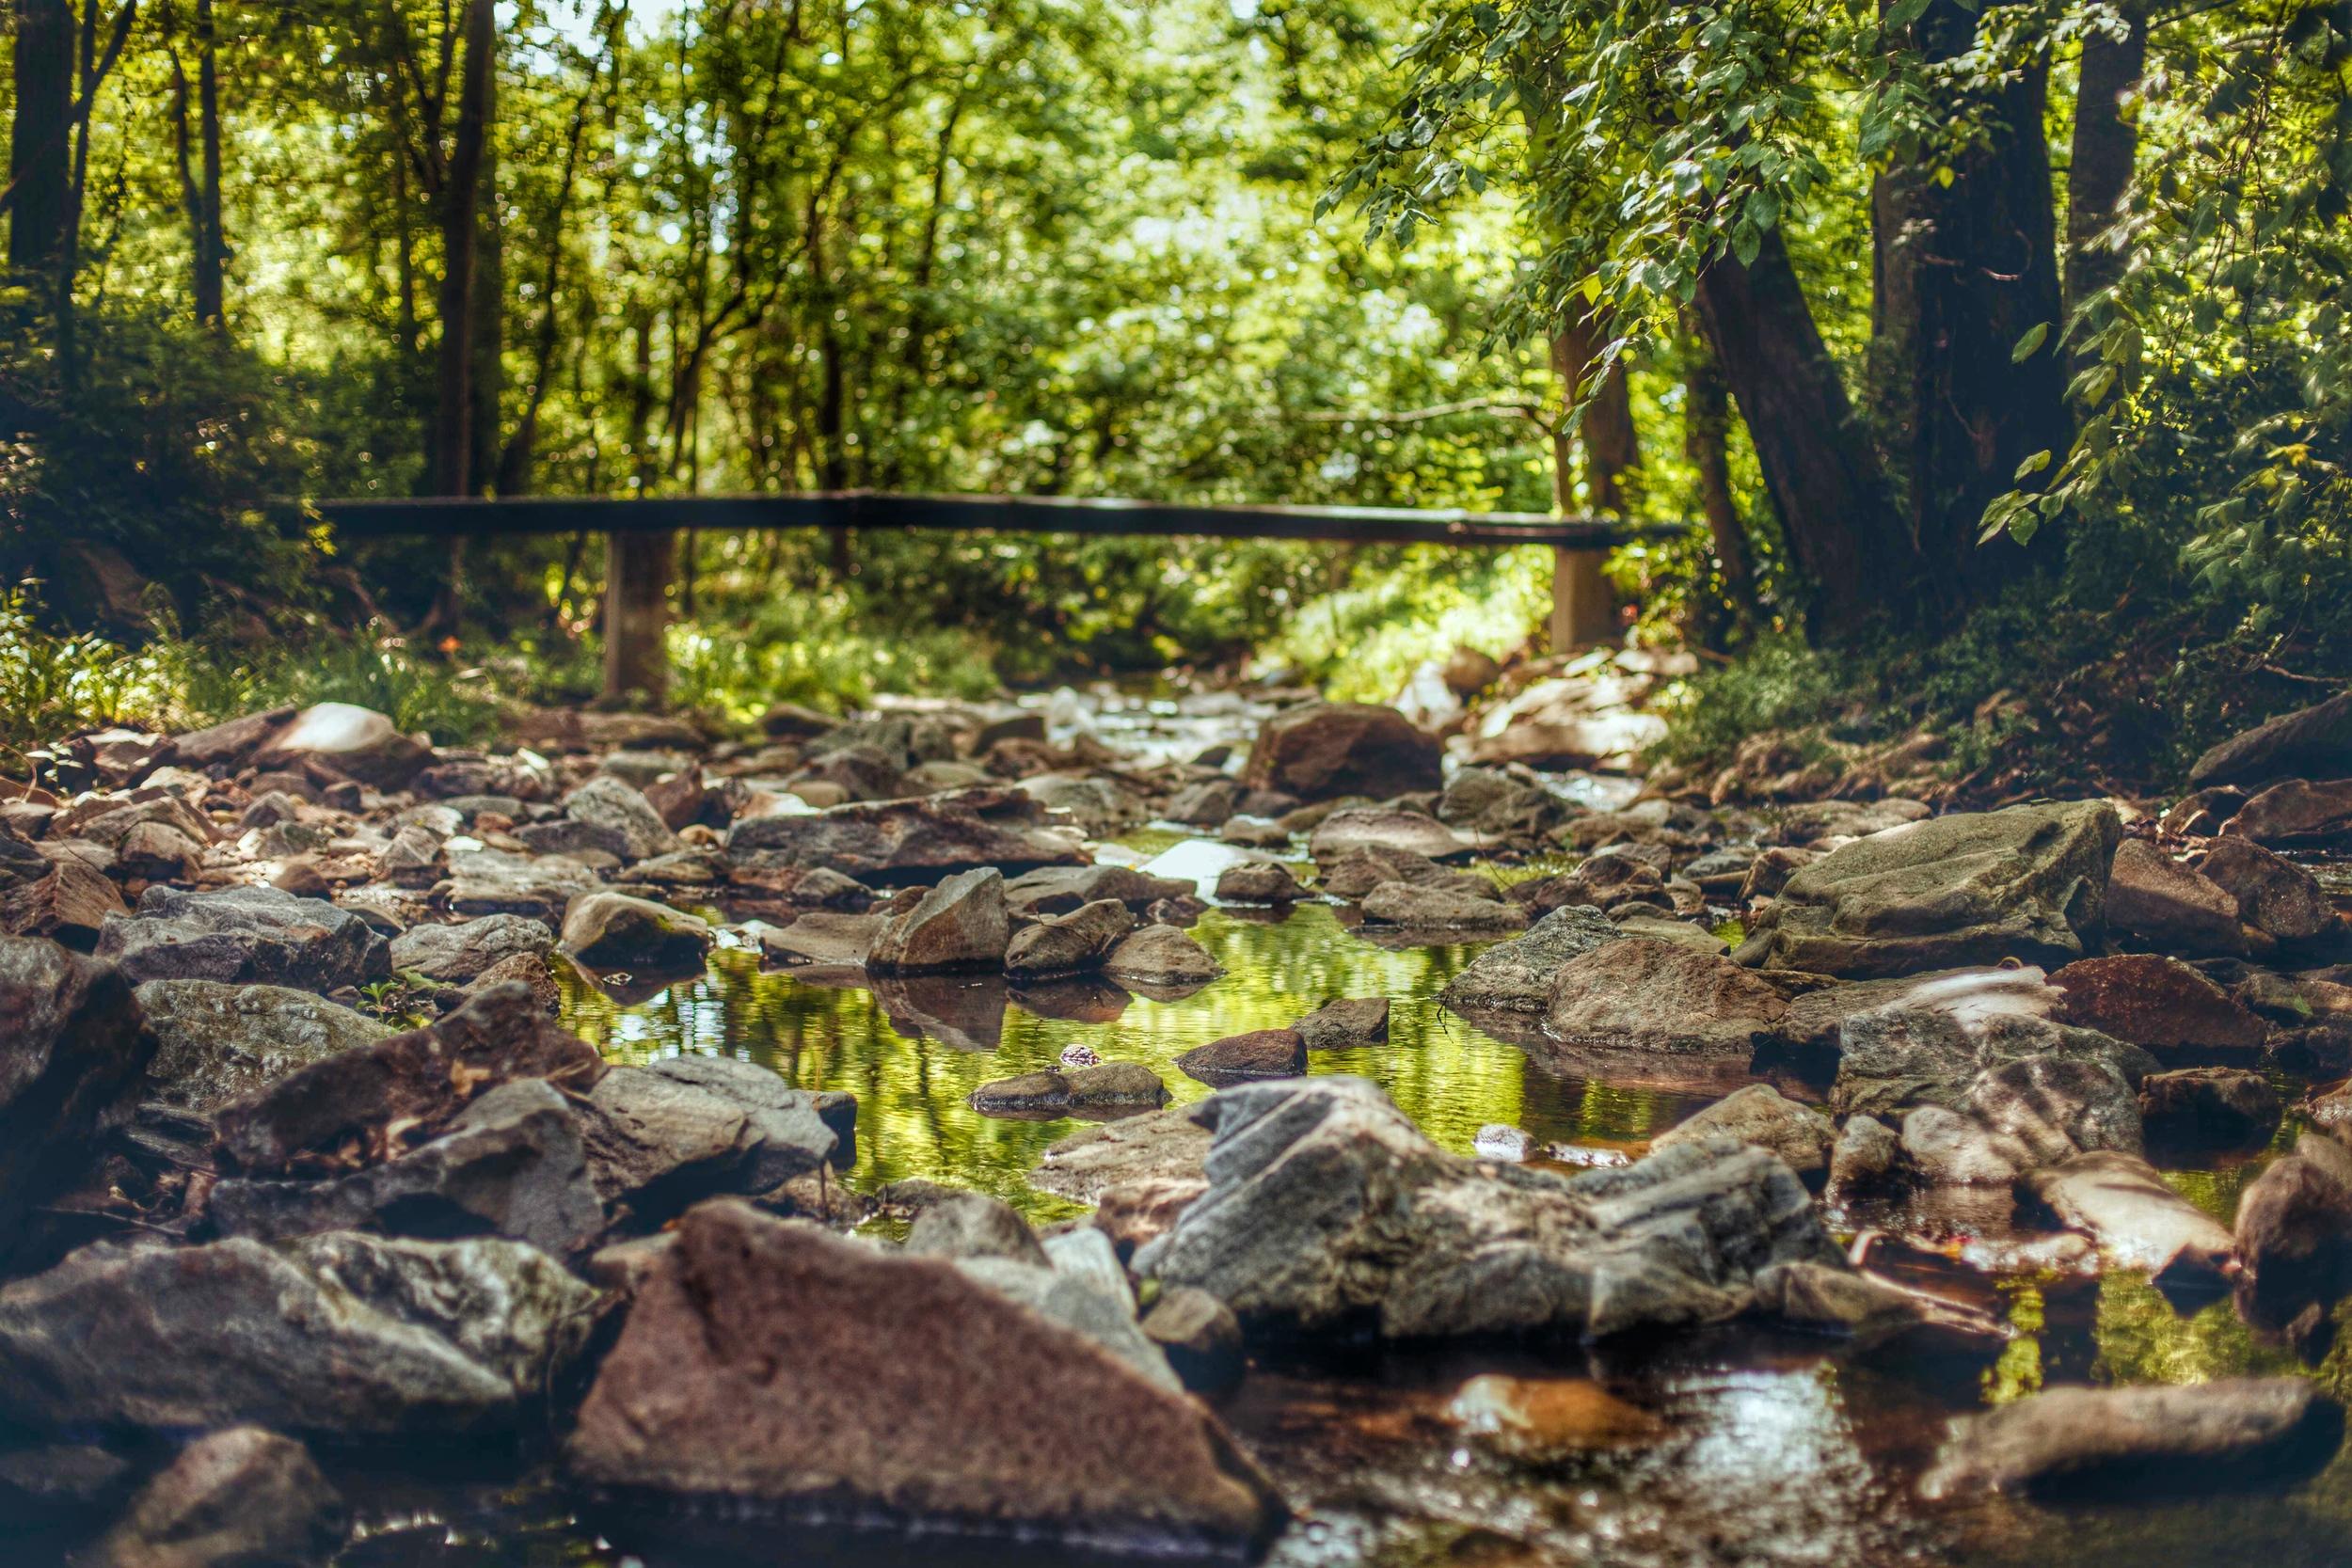 A creek running through the Botanical Gardens.